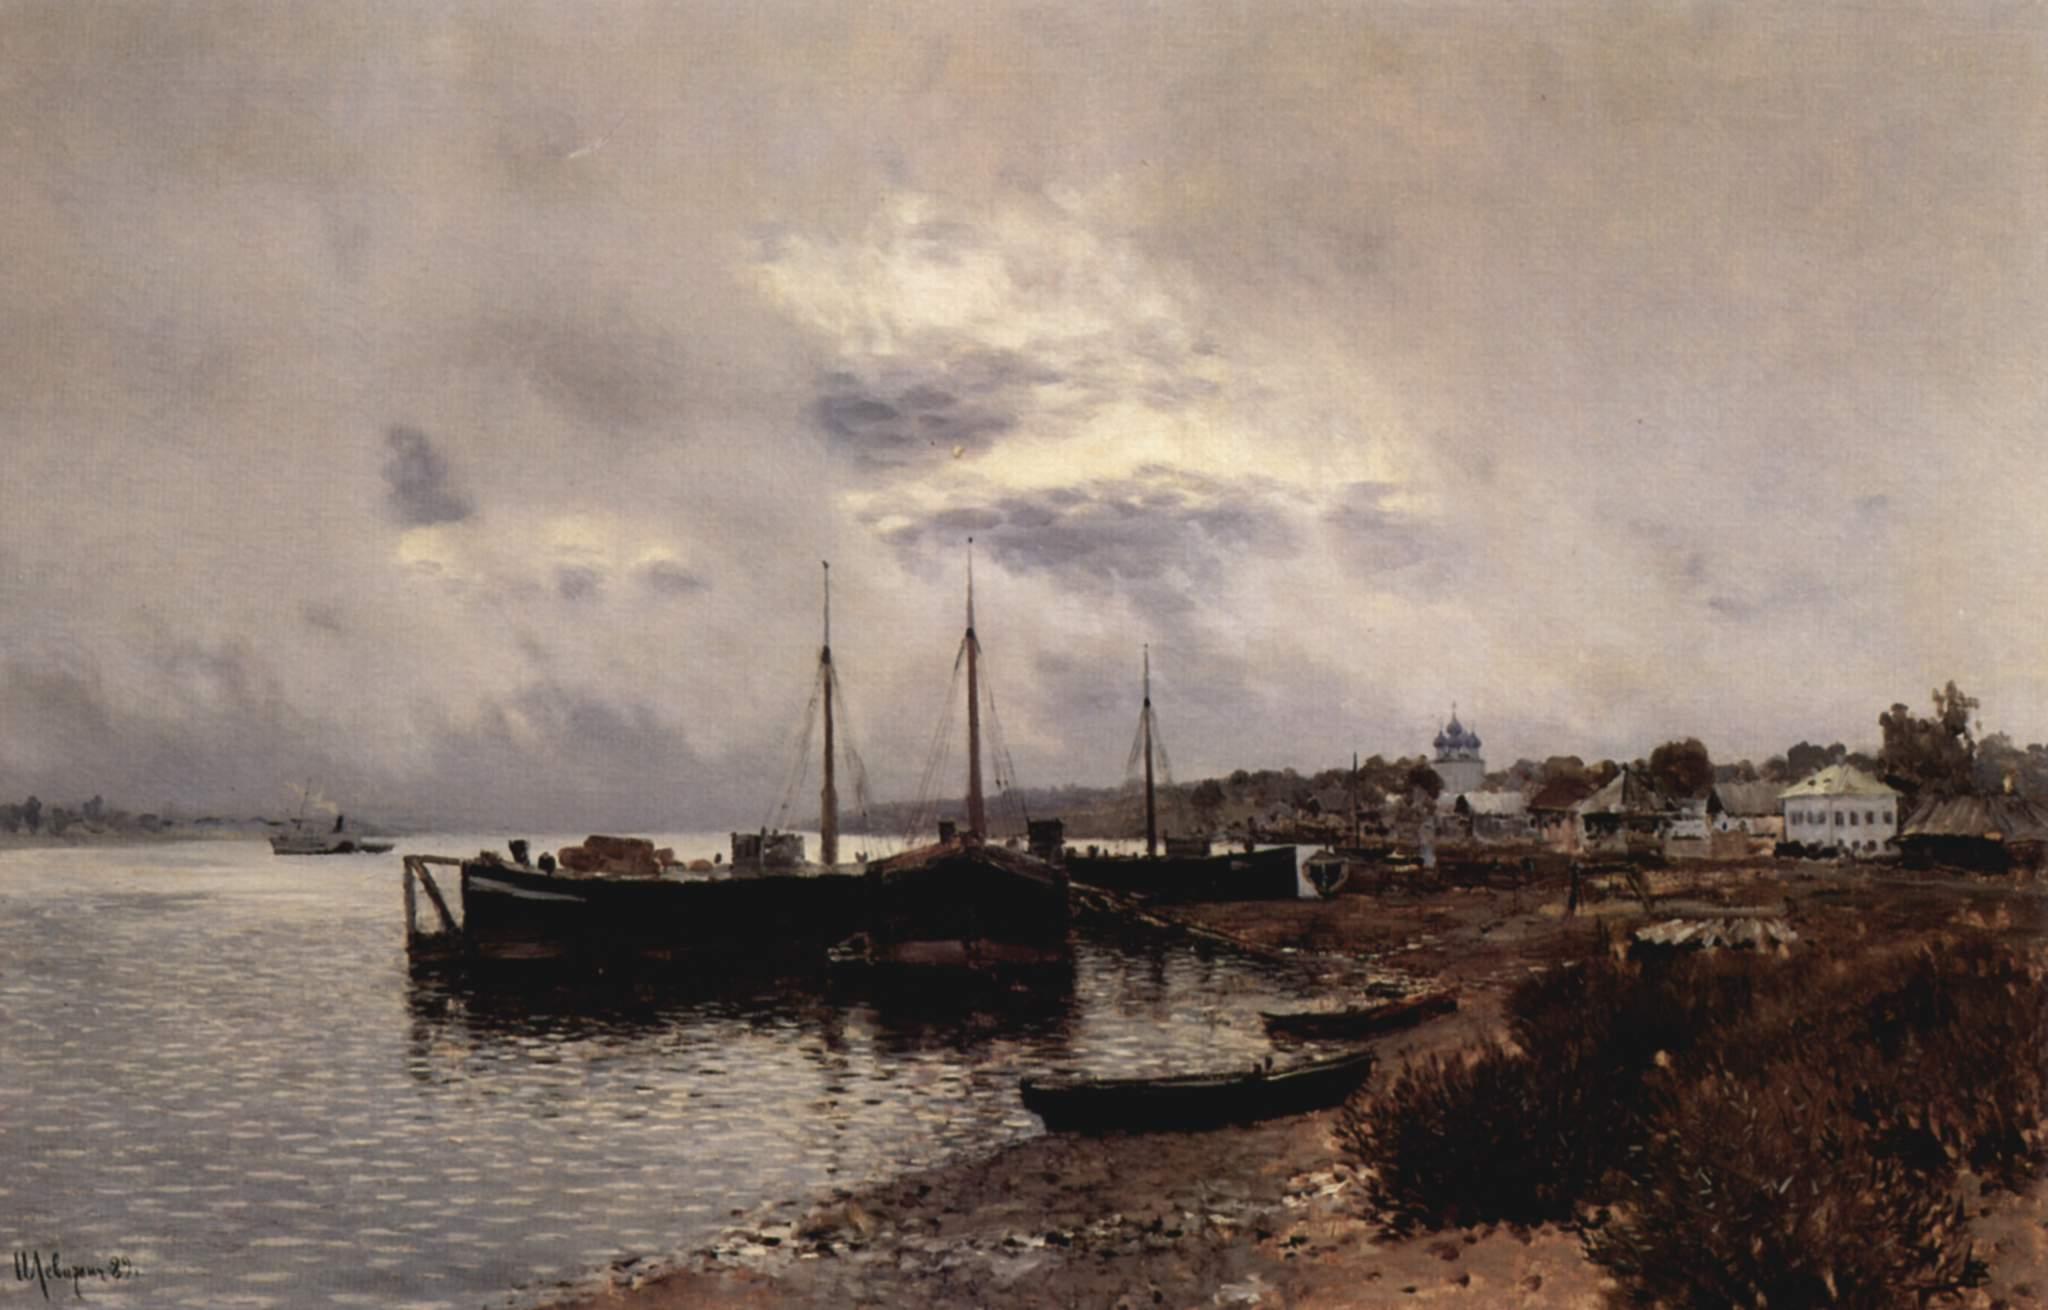 Después de la lluvia en Plyos, la Perla del Volga. Isaac Levitan. 1889